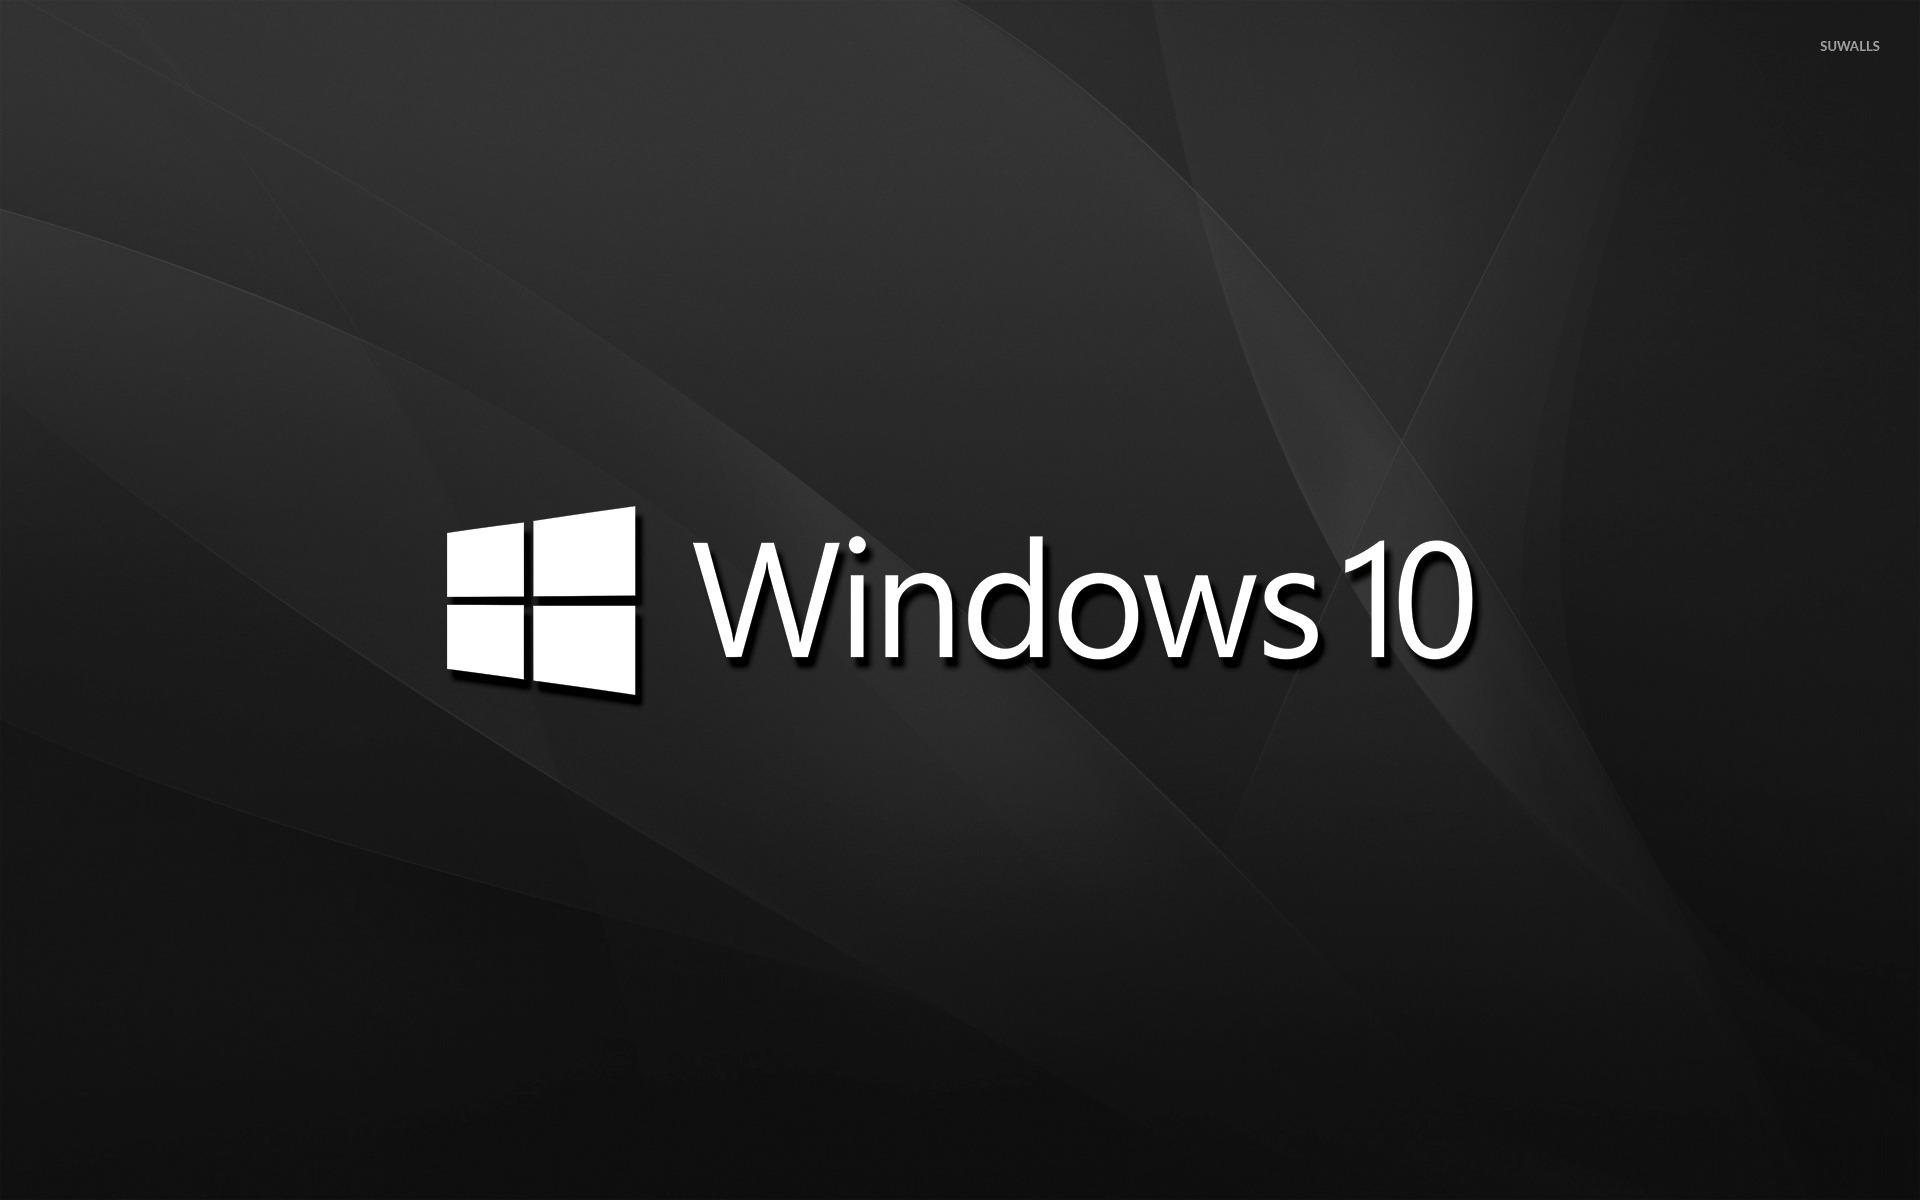 Windows 10 Text Logo On Black Waves Wallpaper Computer Wallpapers 46244